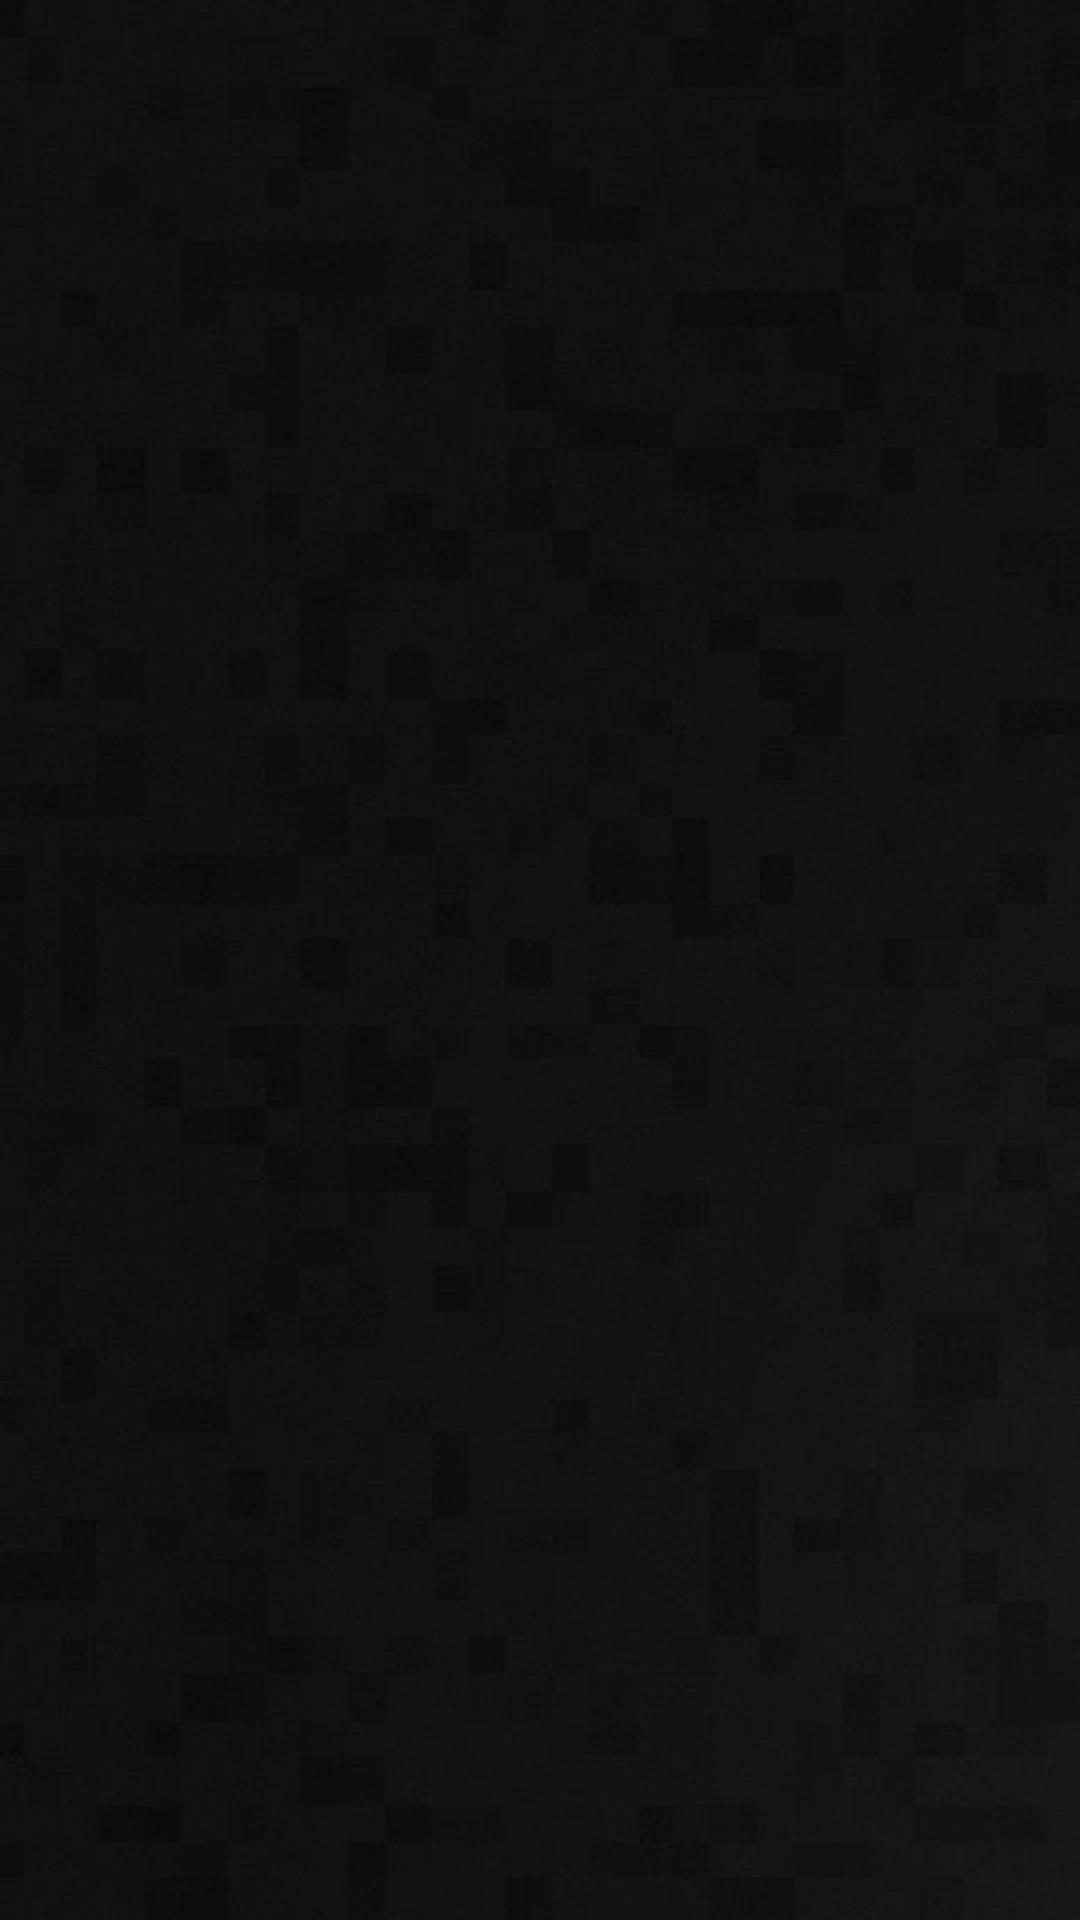 Black Wallpapers Black Iphone 6 Plus Wallpaper